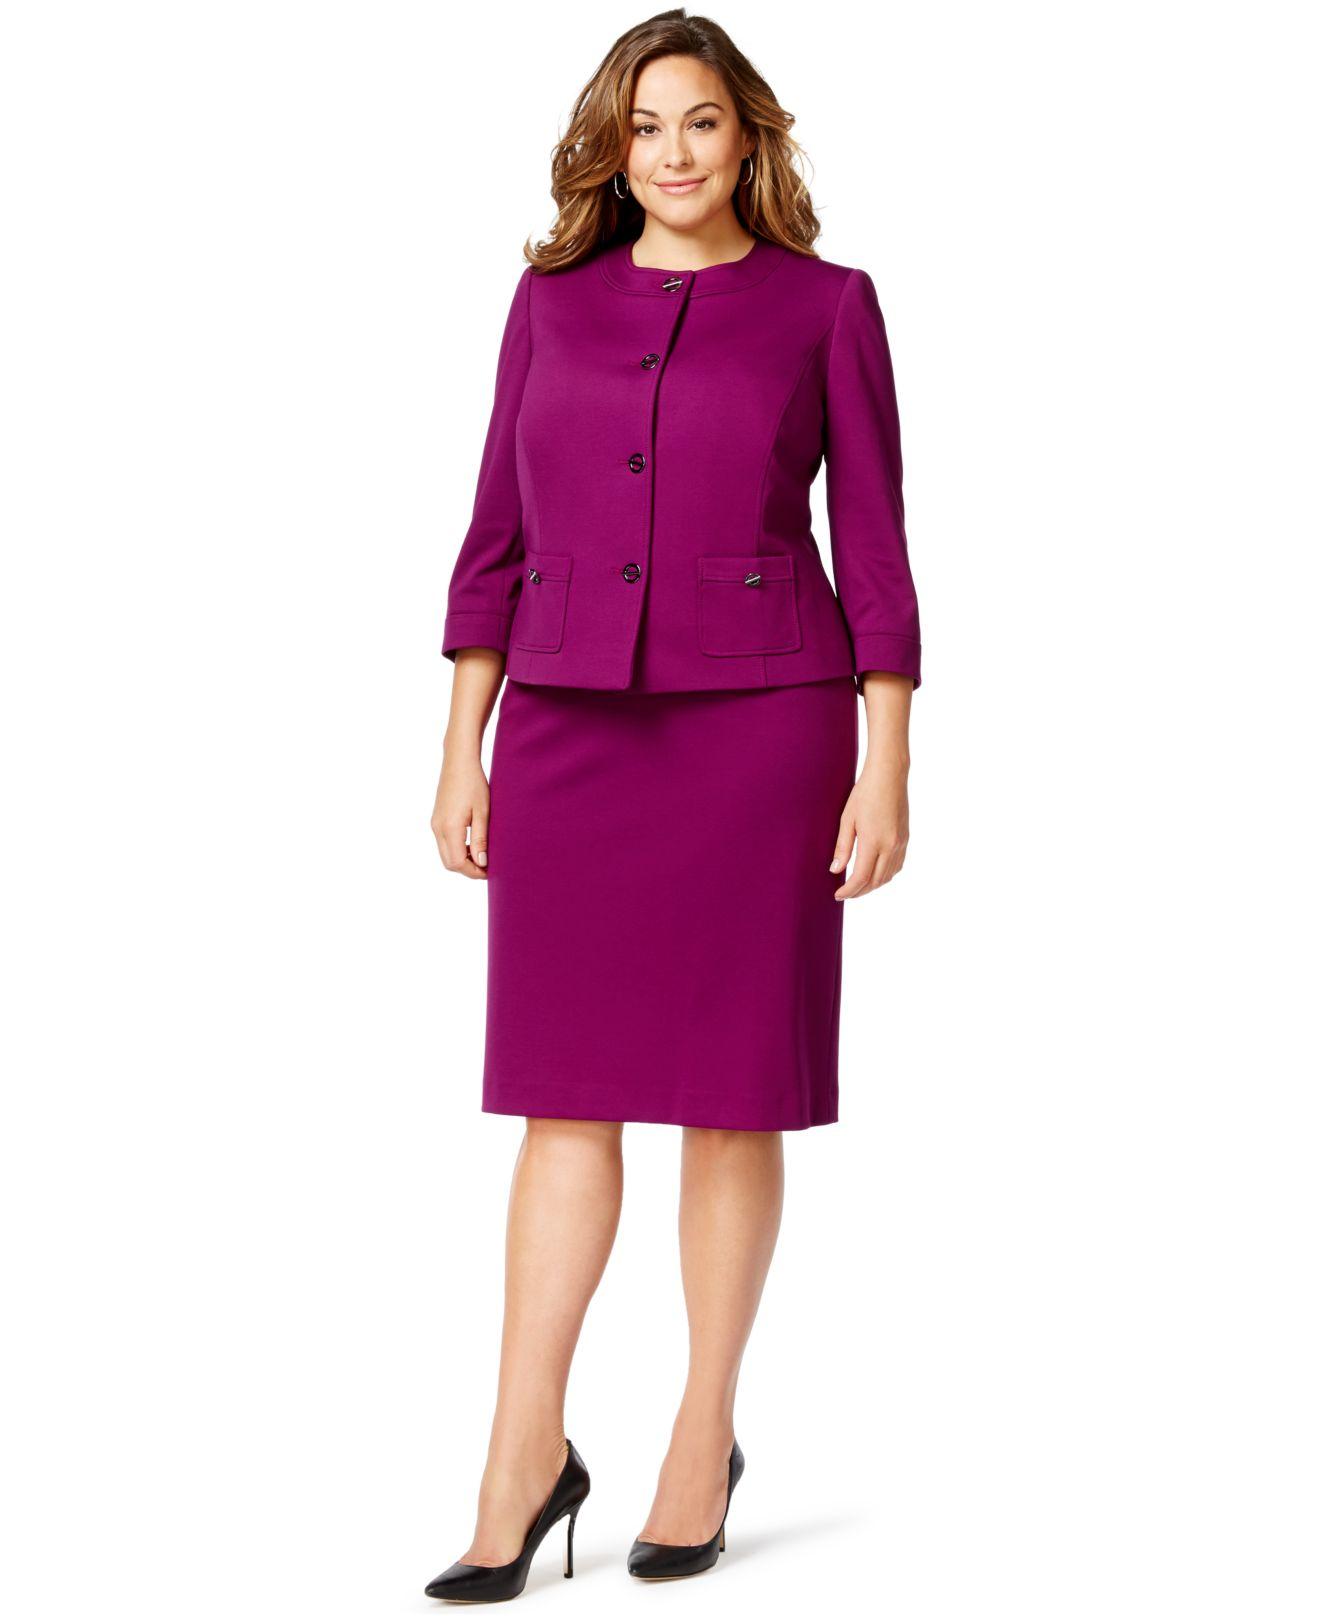 Women\'s Purple Plus Size Ponte Turn-key Skirt Suit